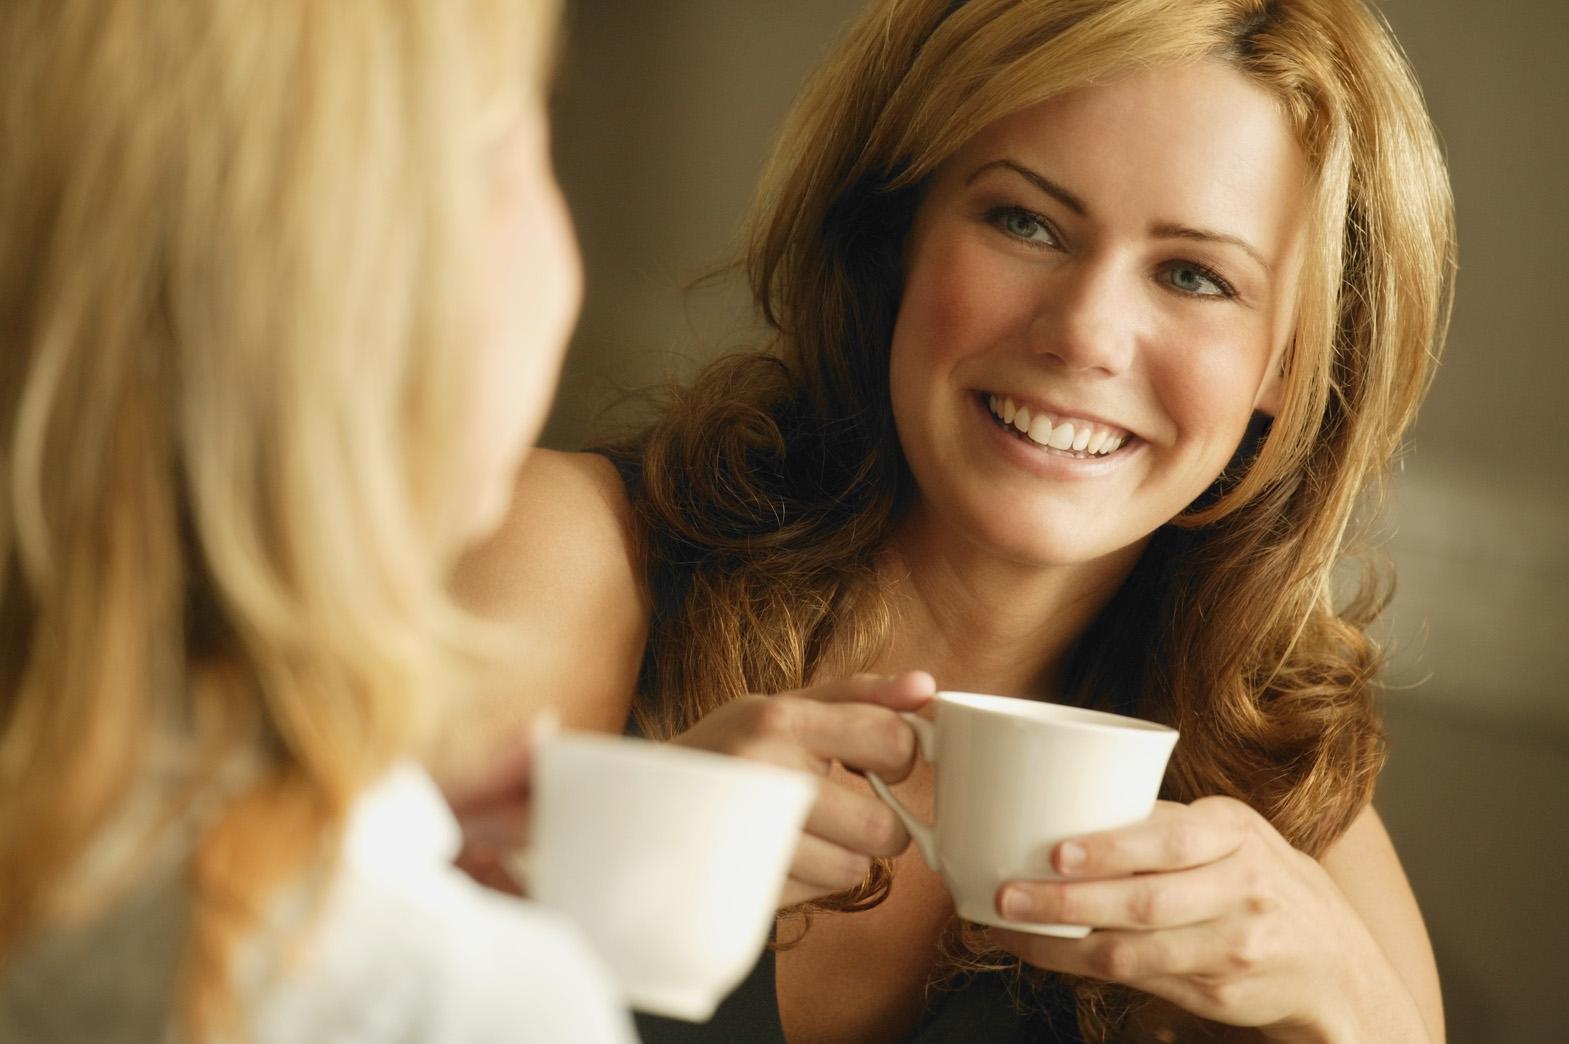 find a coffee lover friend Wannabe Fit: Osam načina da budete zdravije odmah!